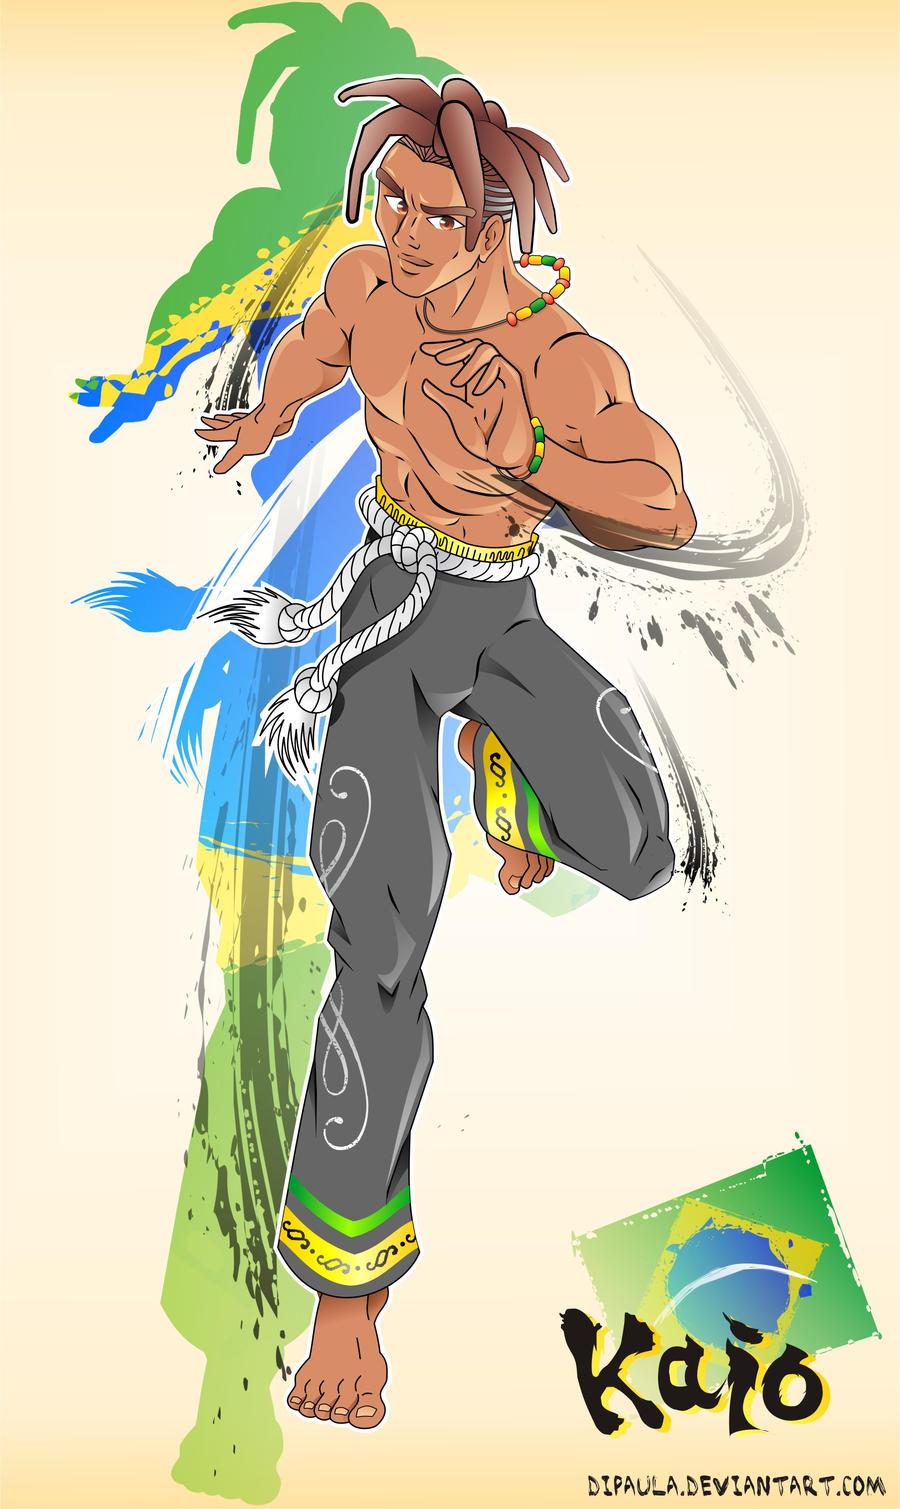 Brazilian Street Fighter by Dipaula on DeviantArt